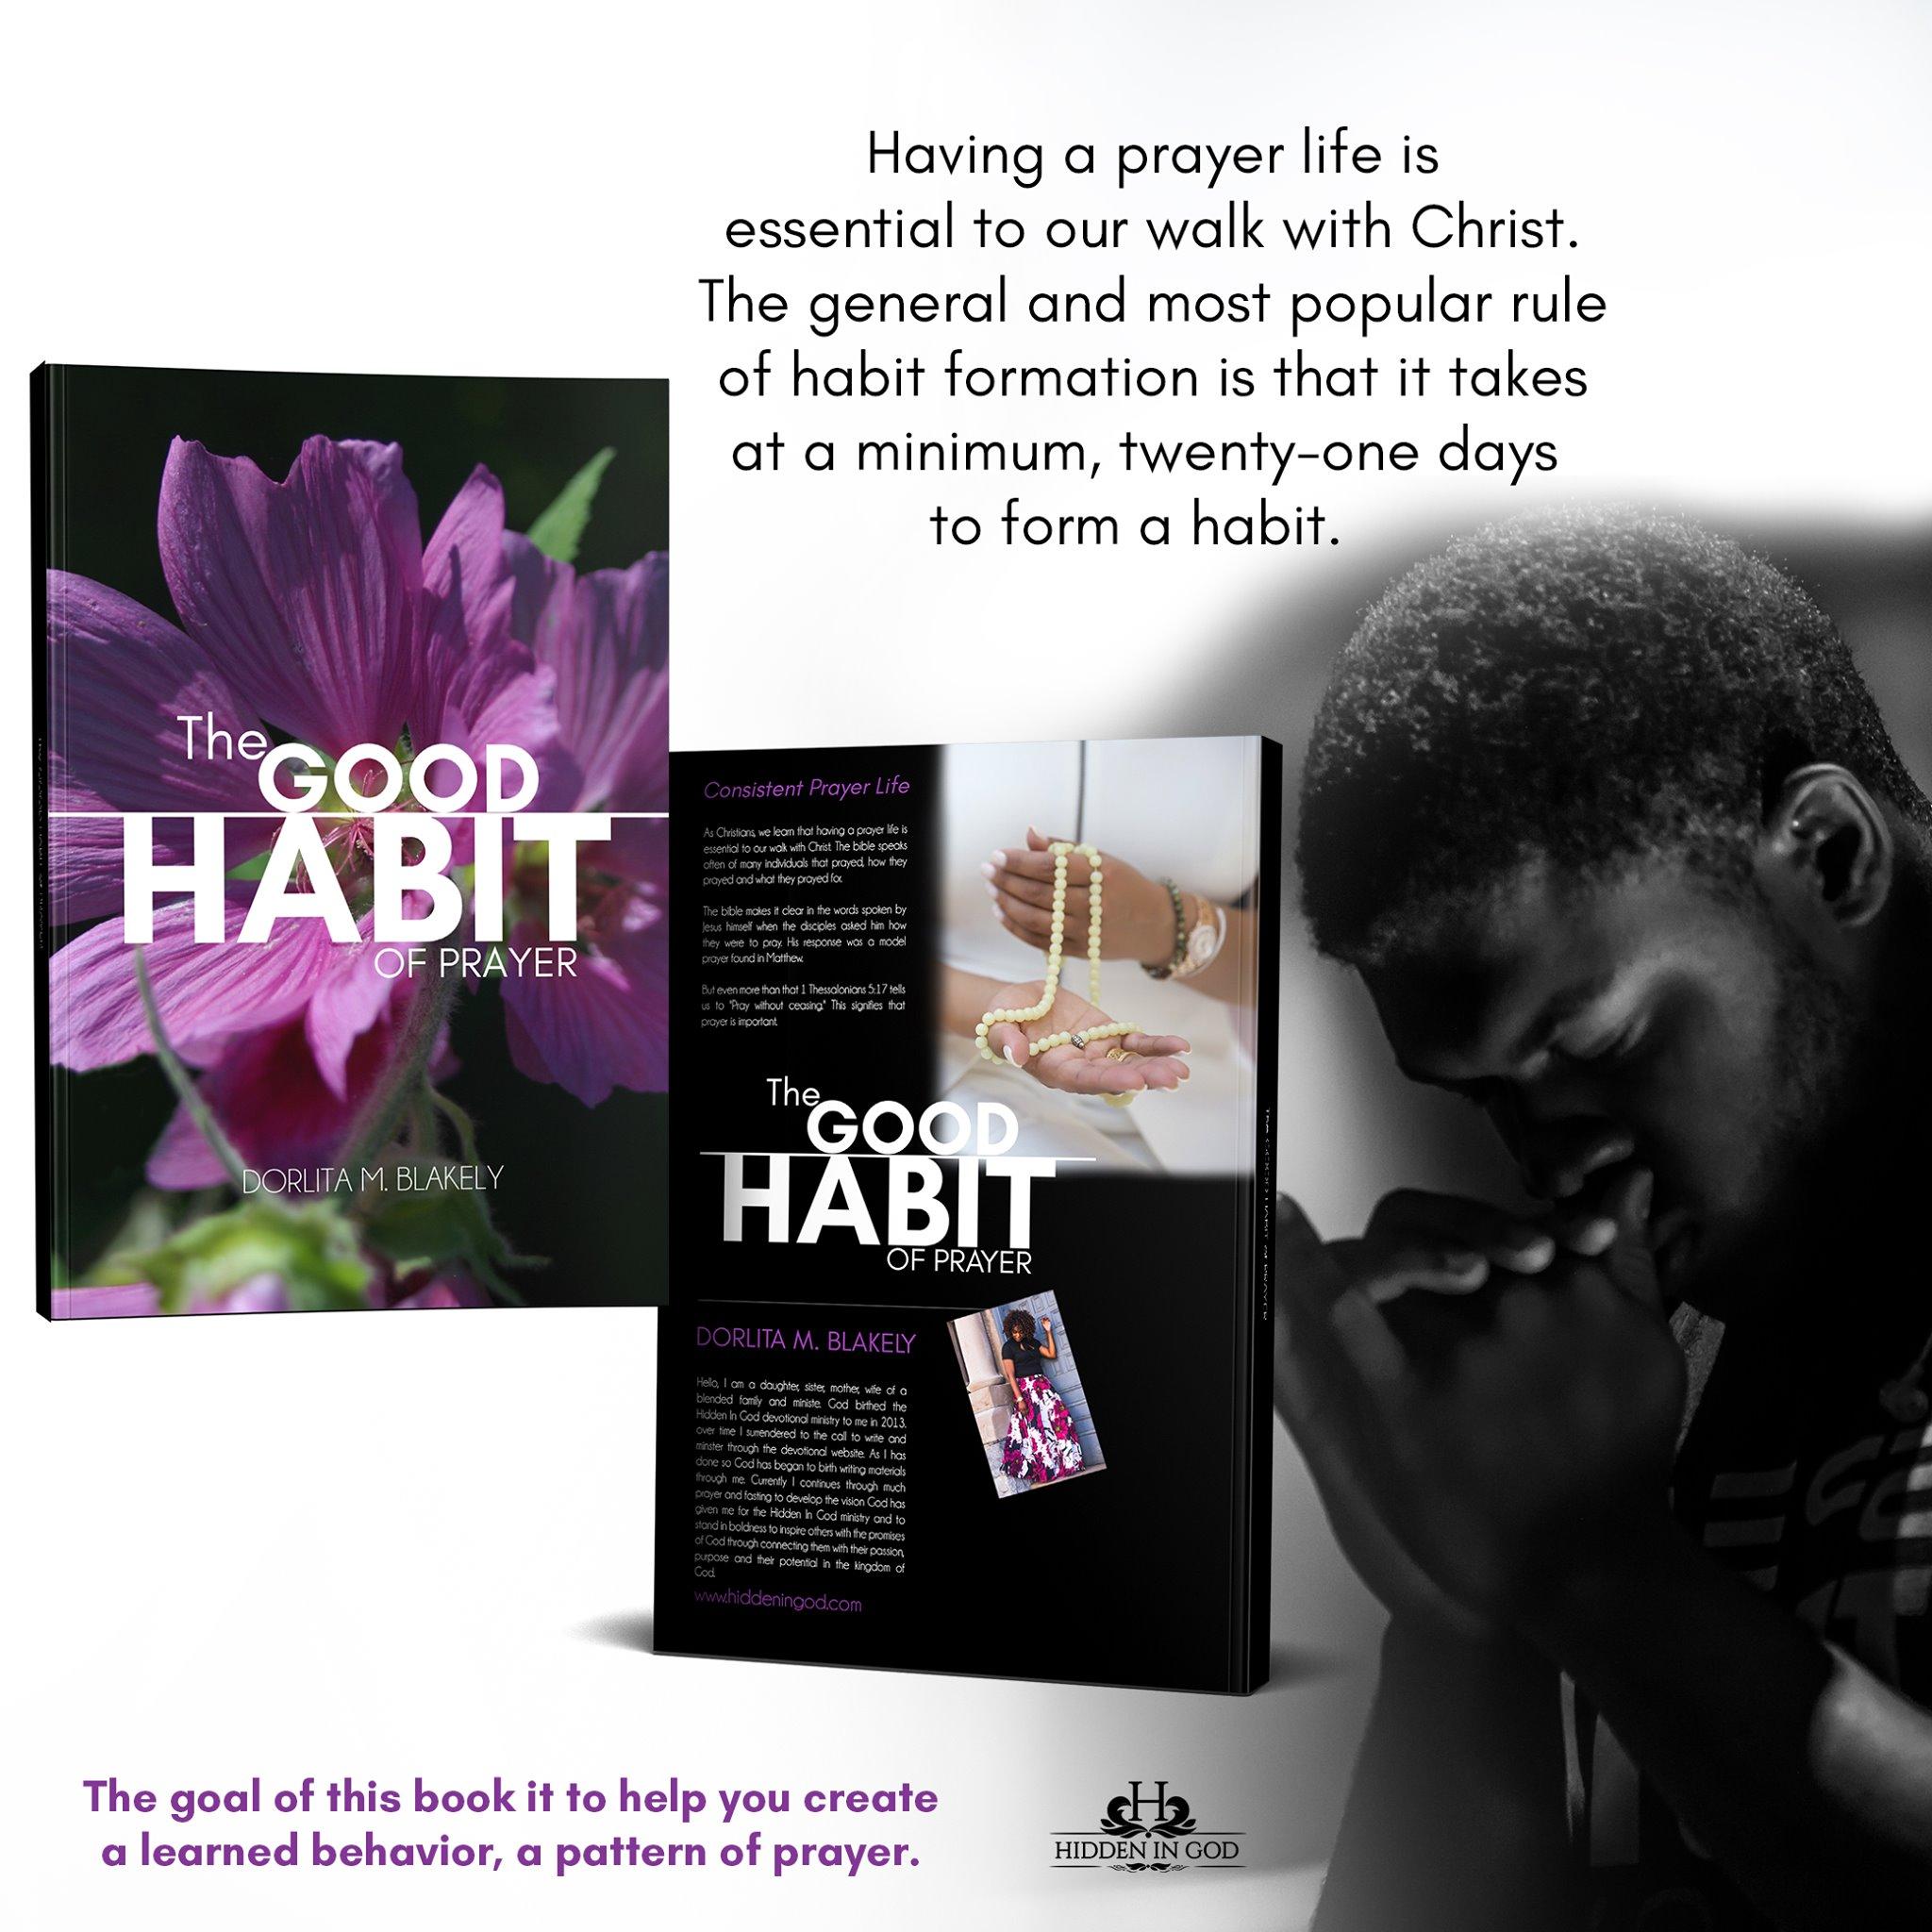 Good habit of prayer ad